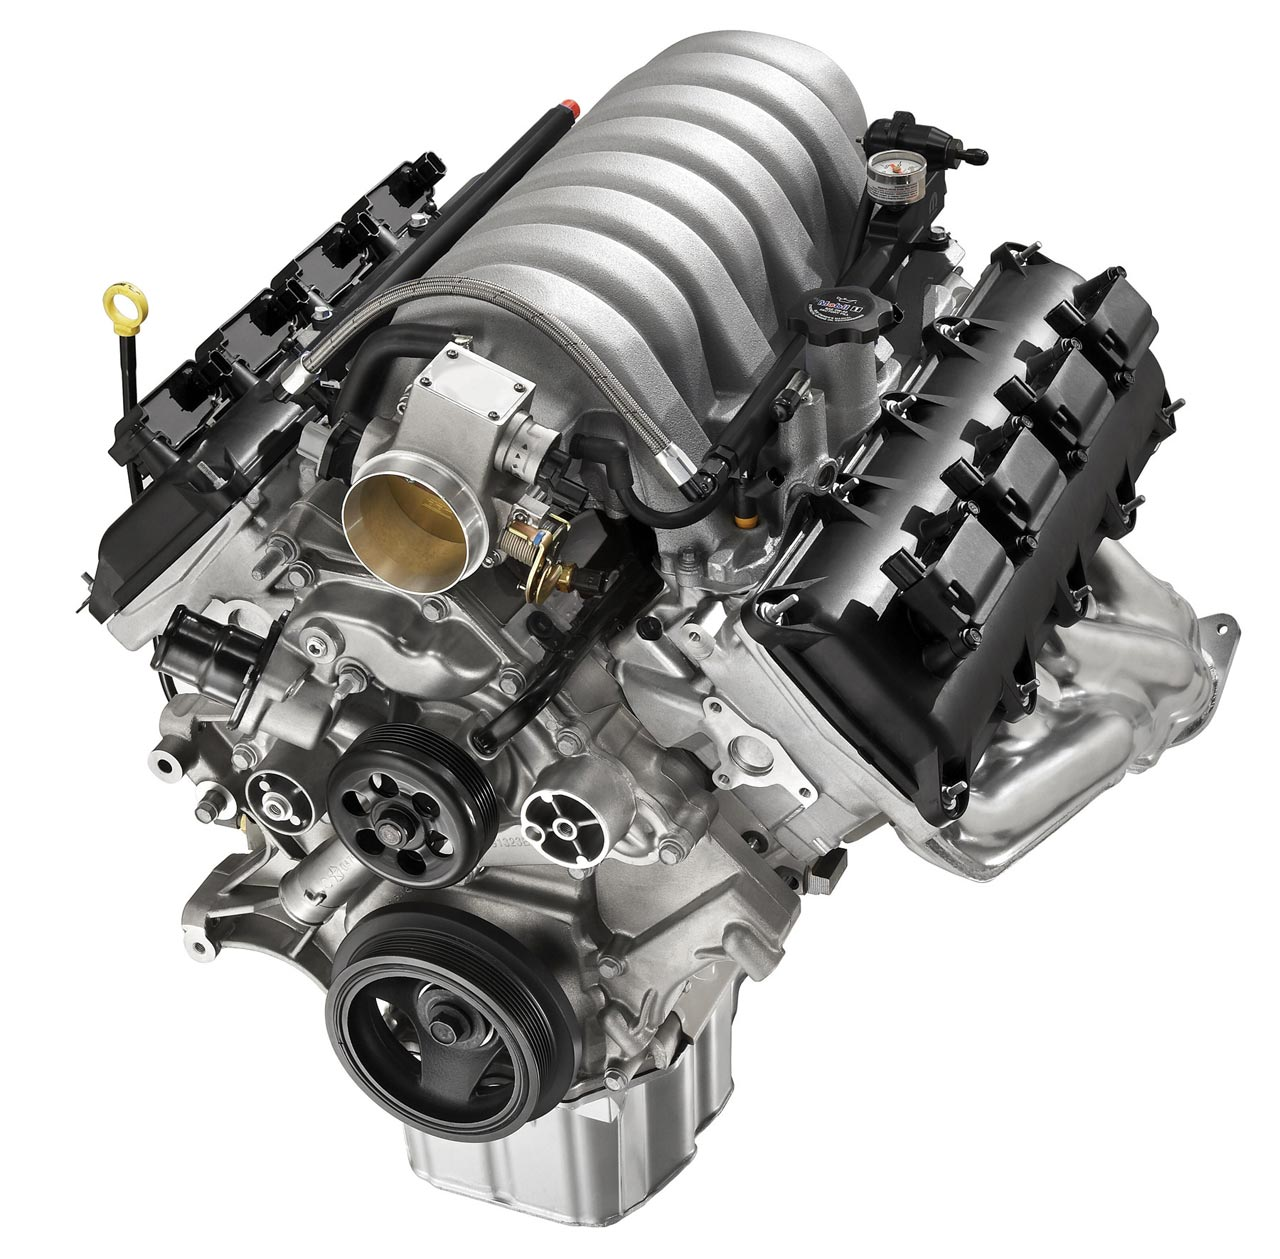 Cold Air Intake For Dodge Ram 1500 5.7 Hemi >> Mopar 426 'Elephant' Hemi V8 Revealed - autoevolution